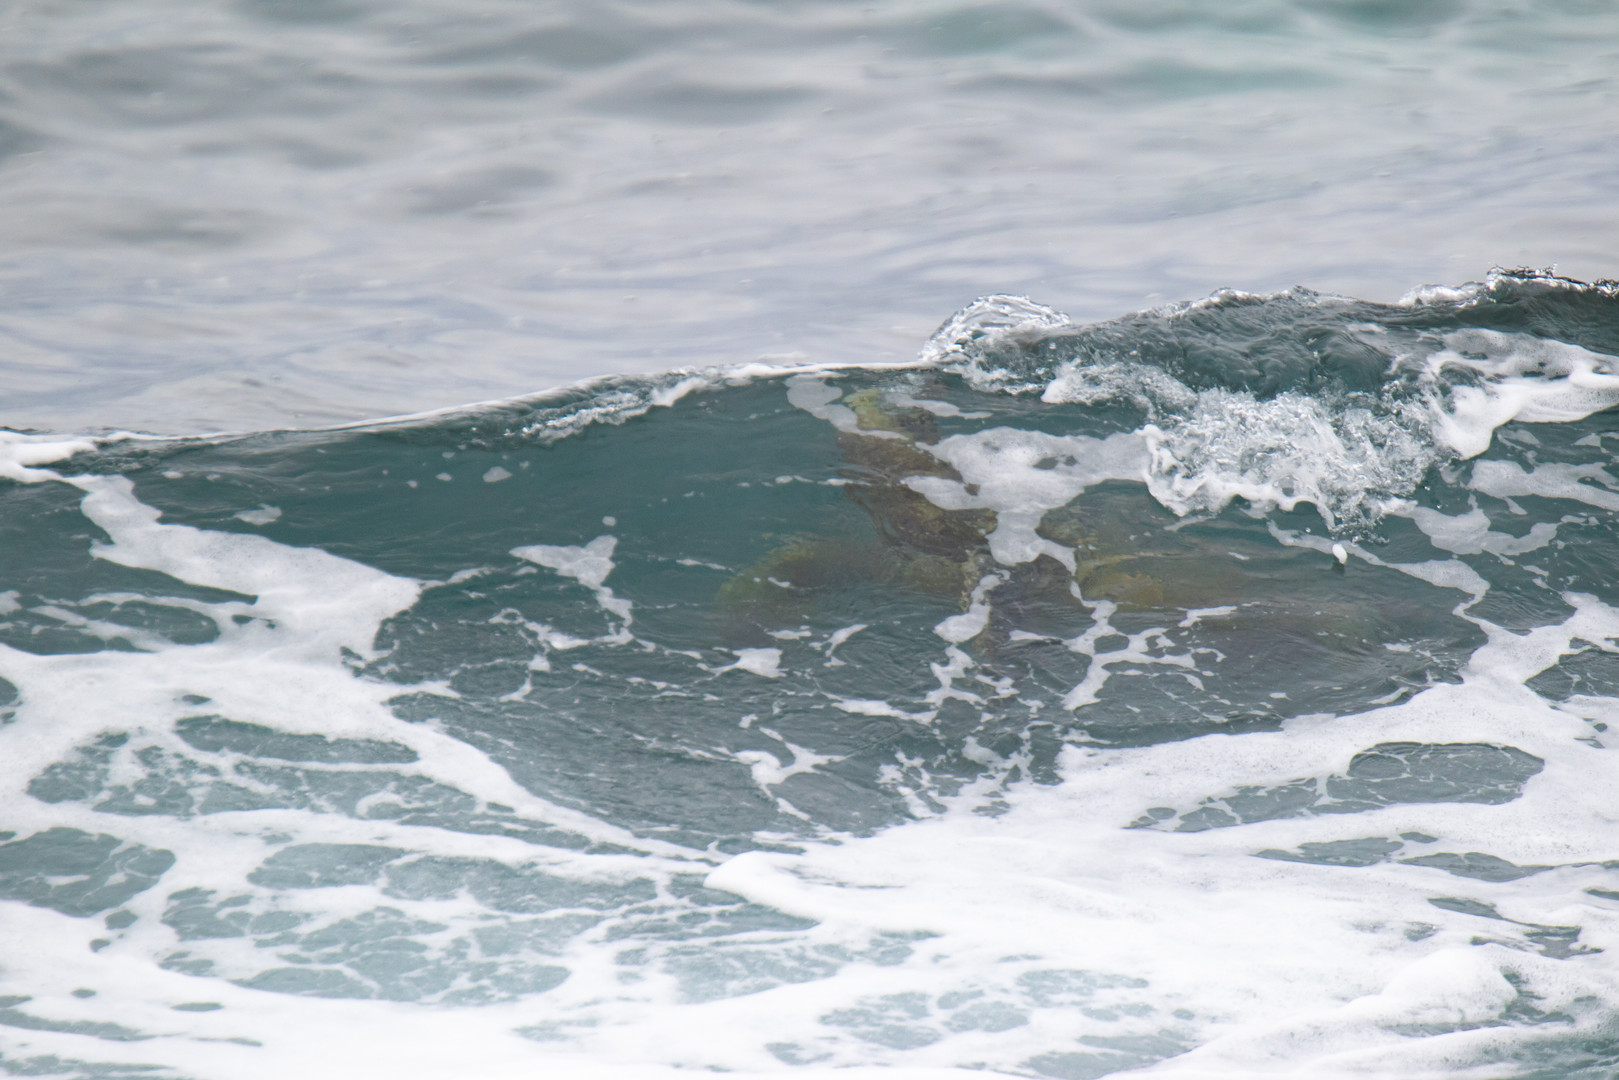 En haut de la vague / At the top of the wave